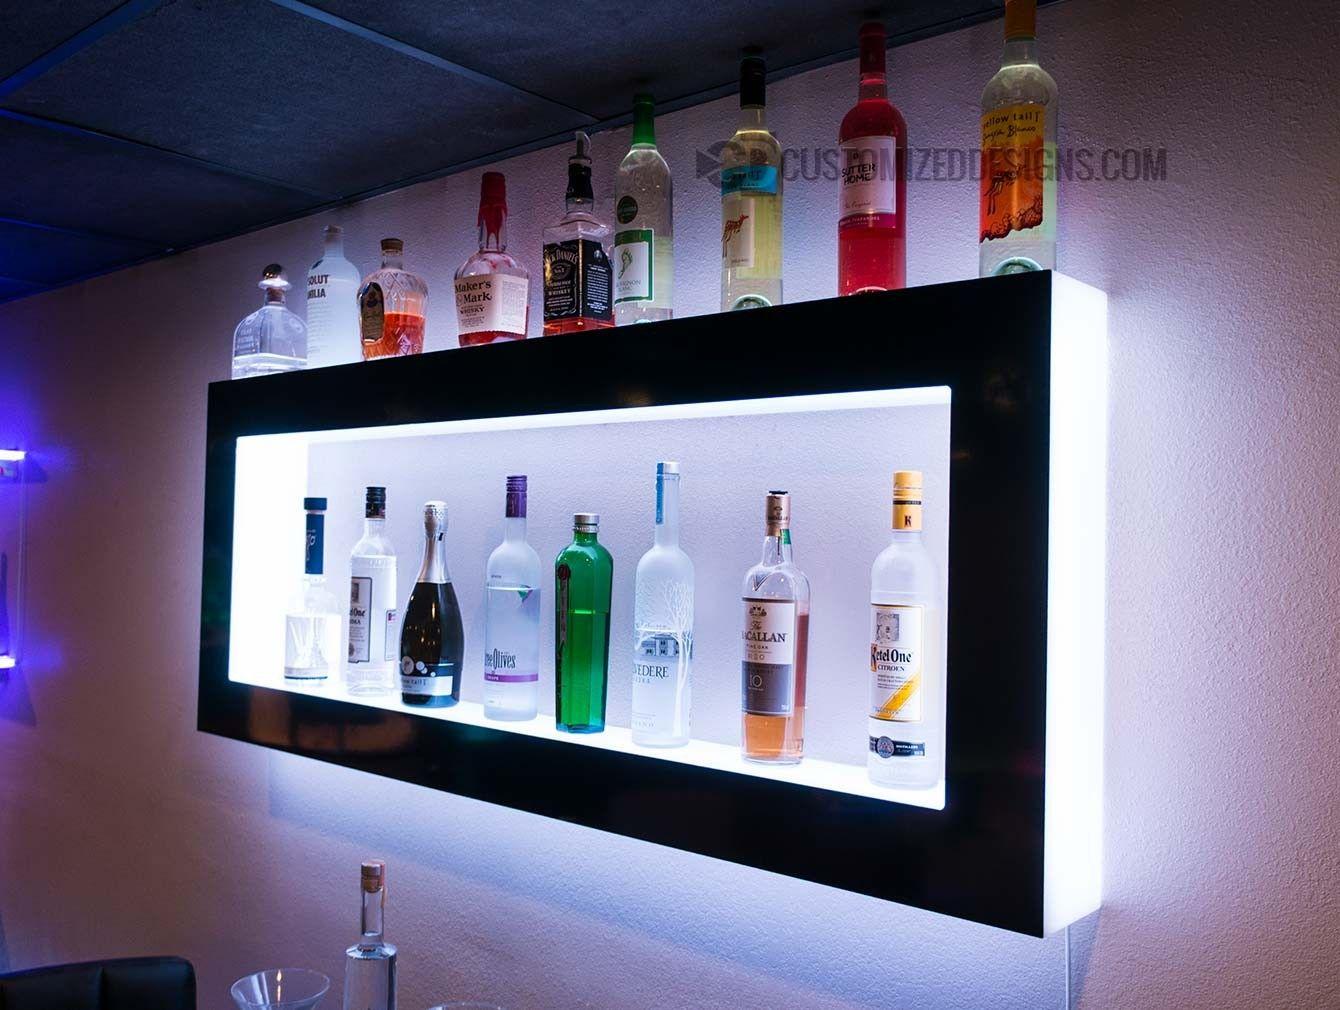 Lighted Back Bar Wall Display Shelves Led Lighting Modern Design In 2020 Wall Bar Diy Home Bar Home Bar Designs